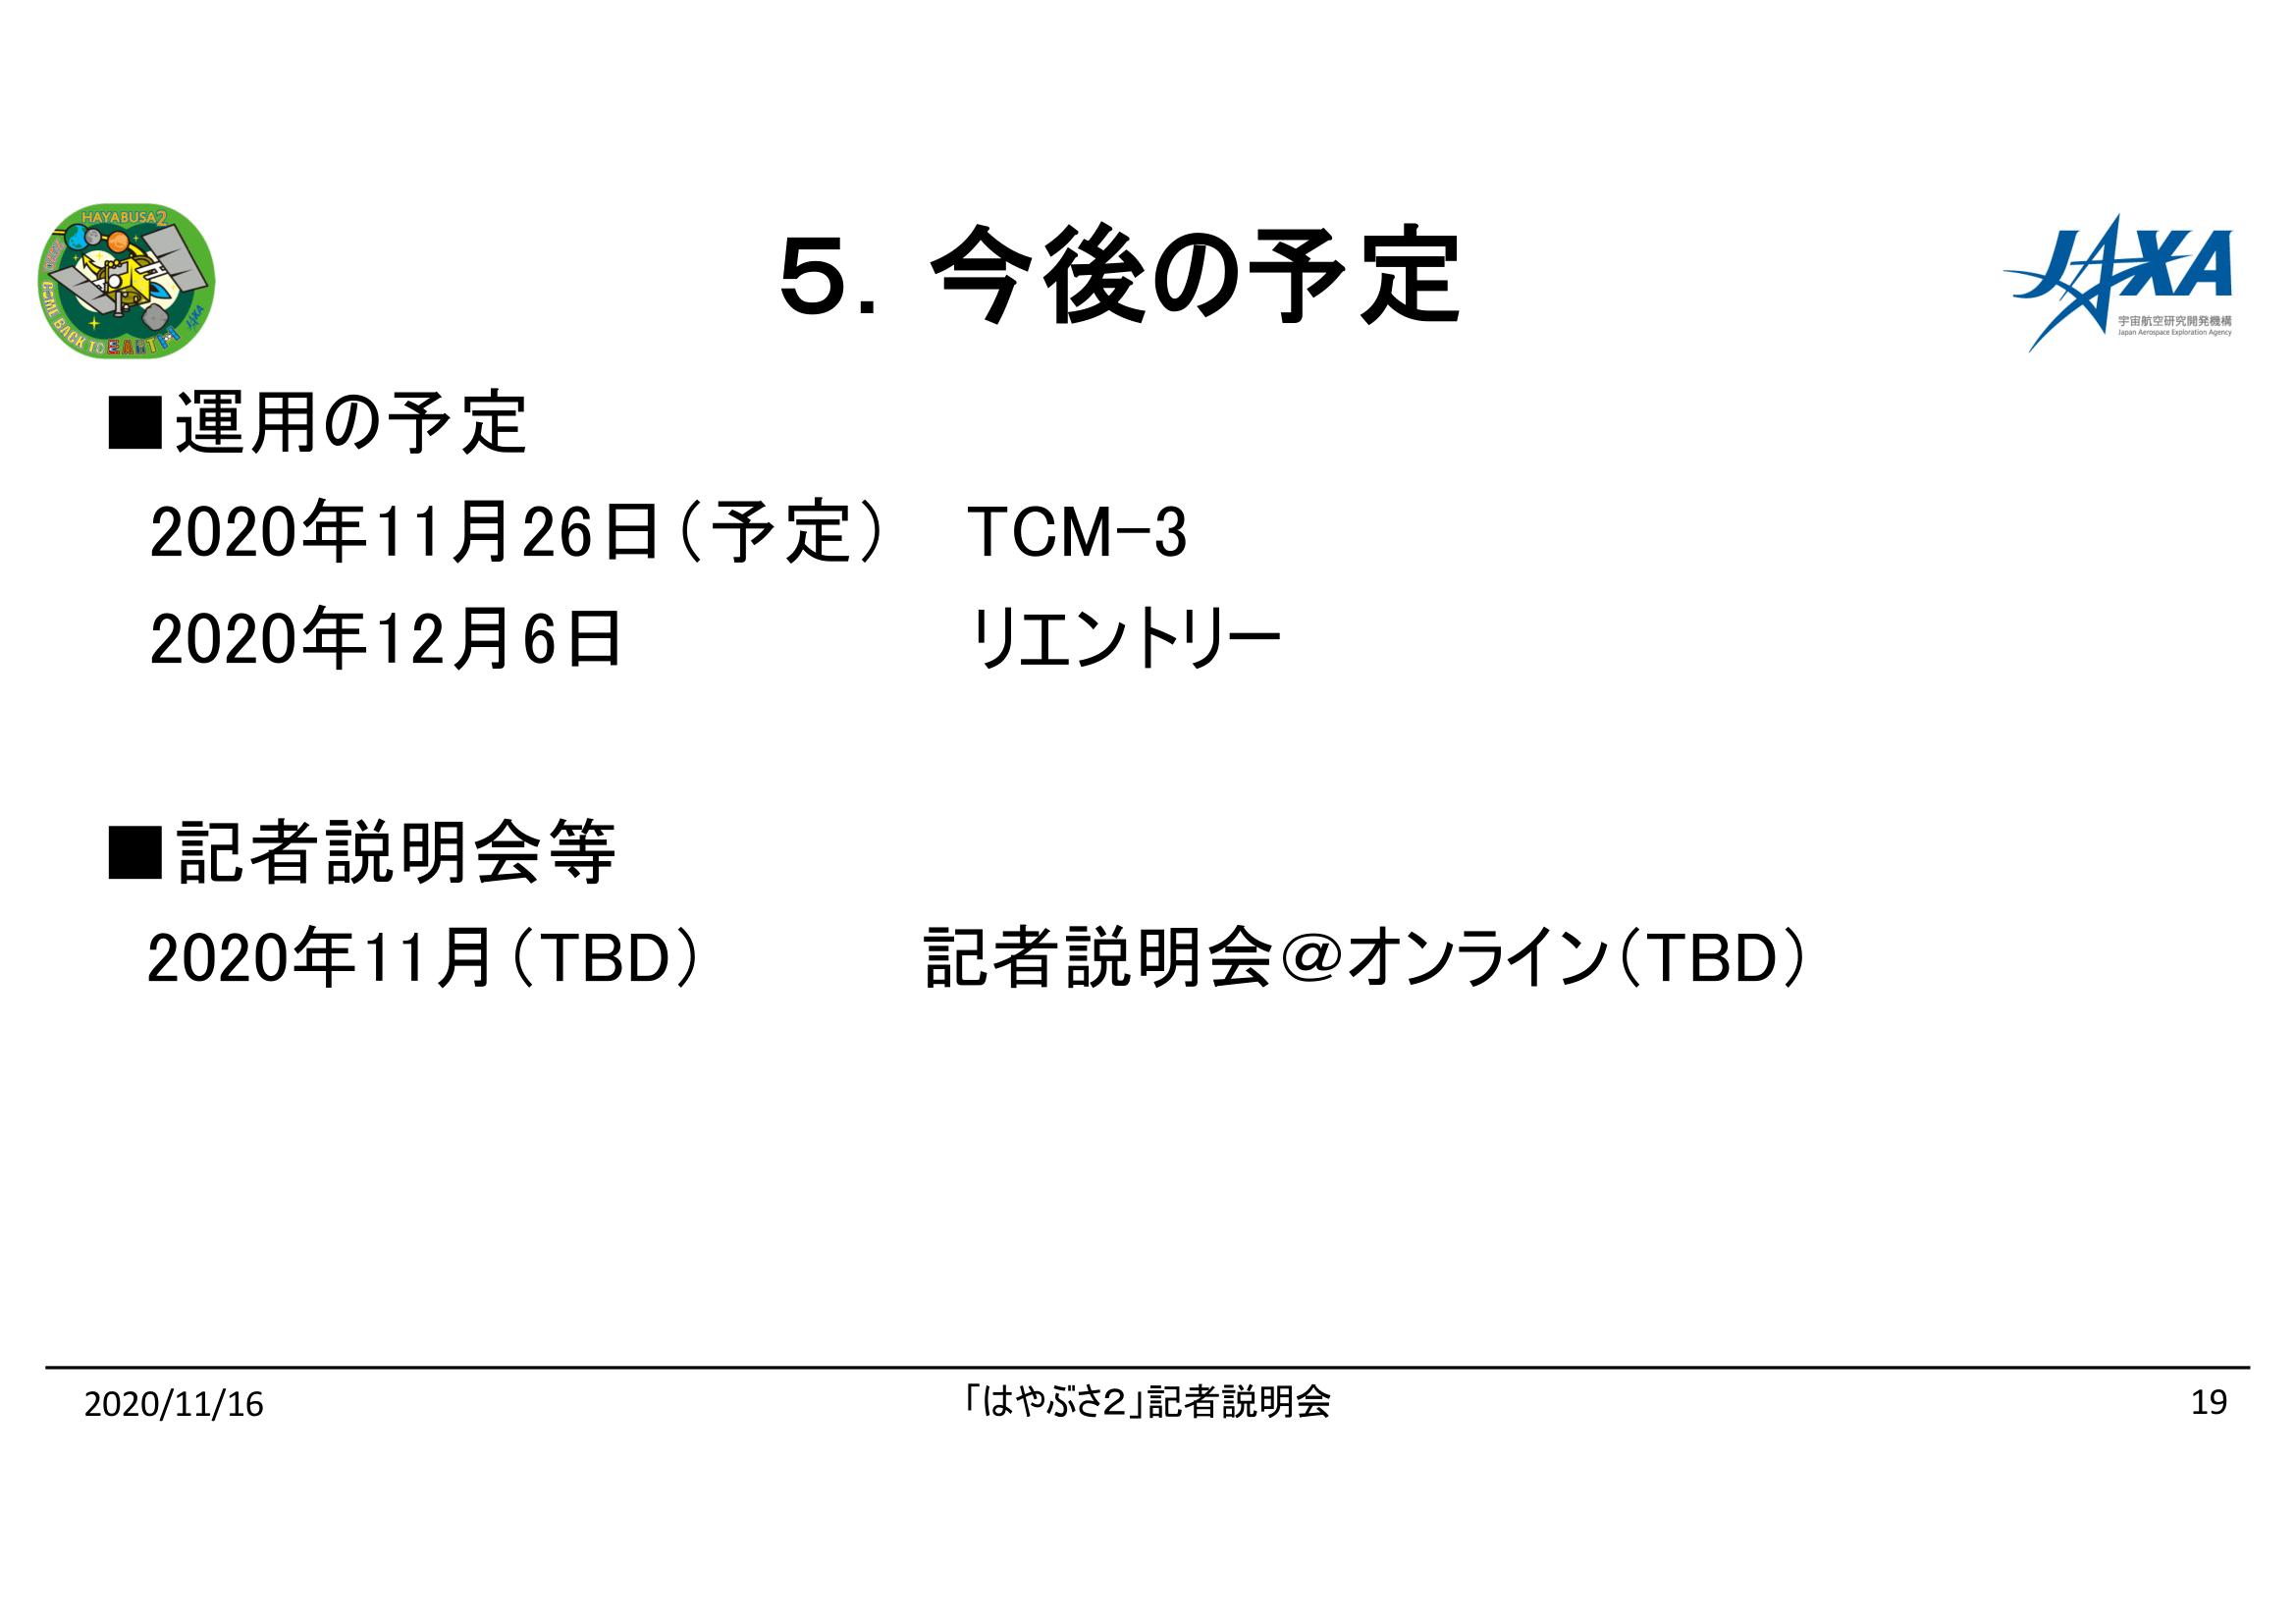 f:id:Imamura:20201116151334p:plain